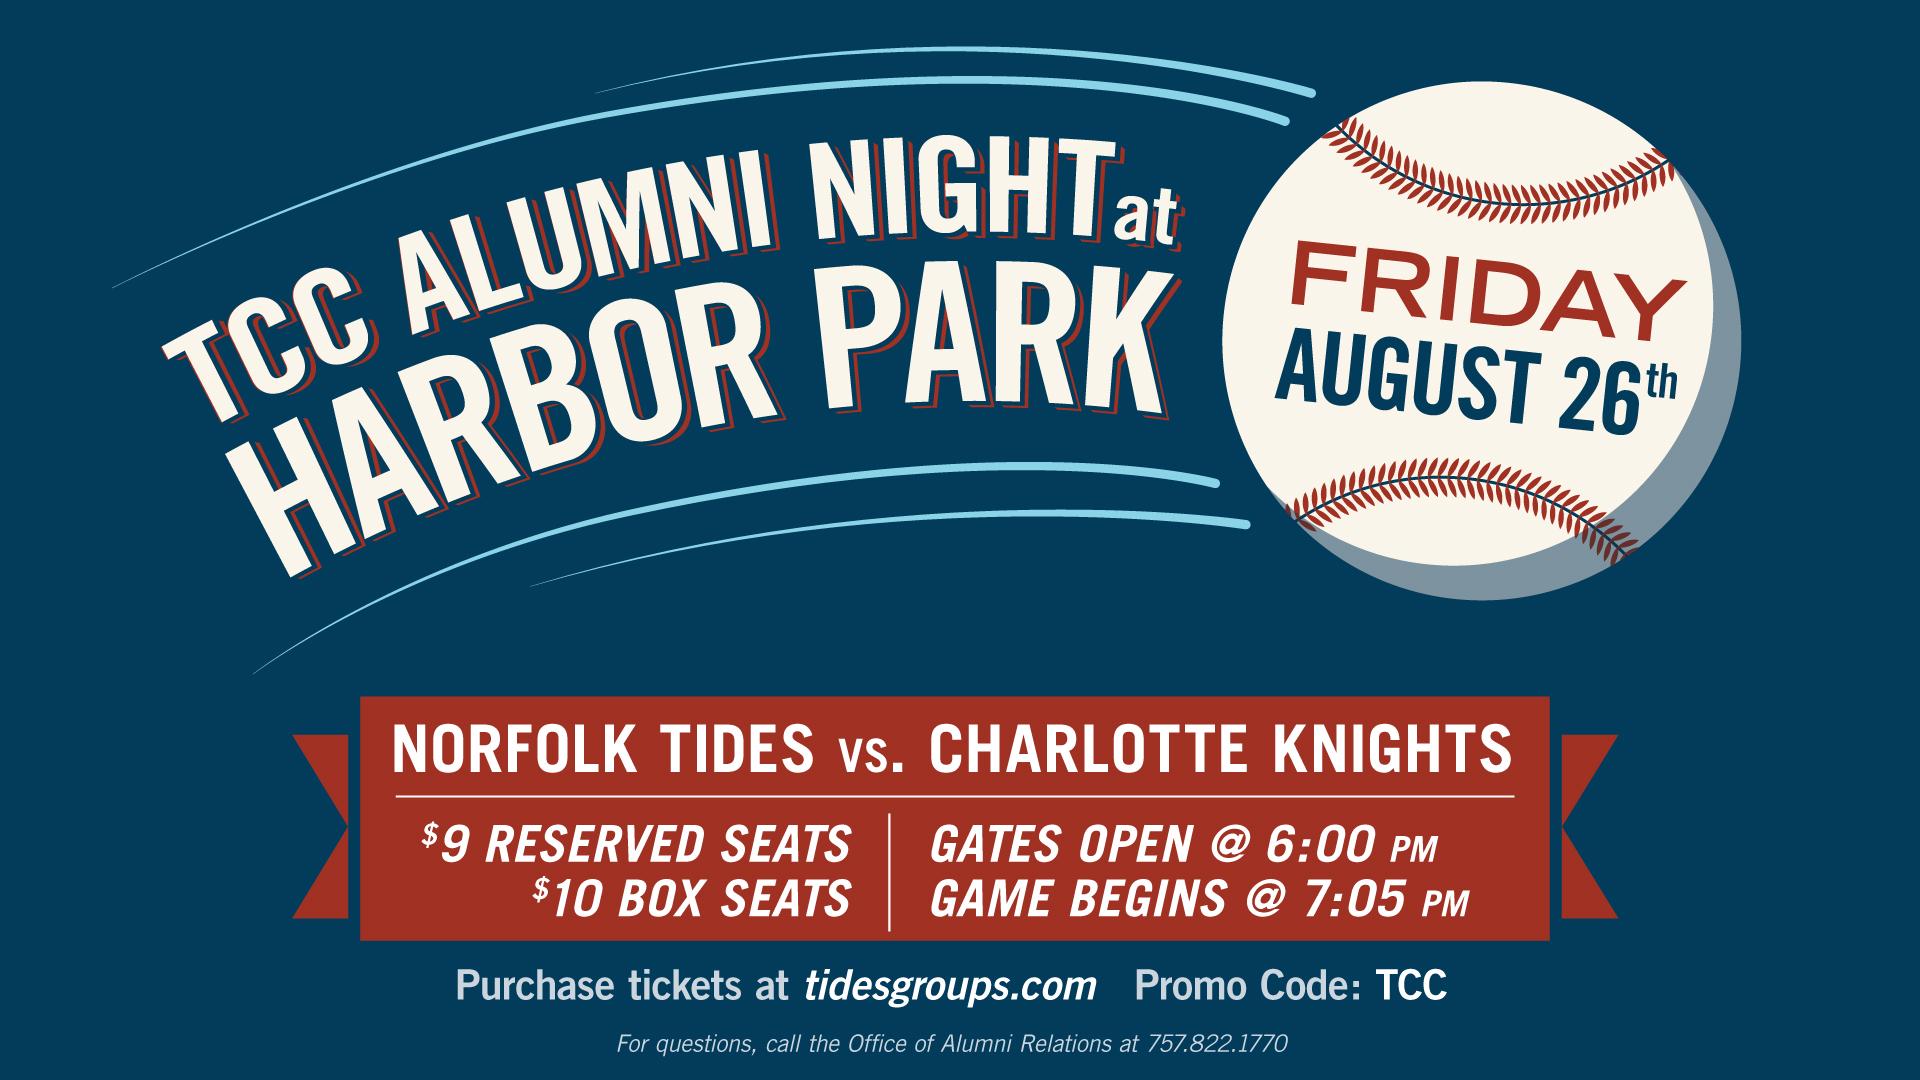 Alumni Night at Harbor Park